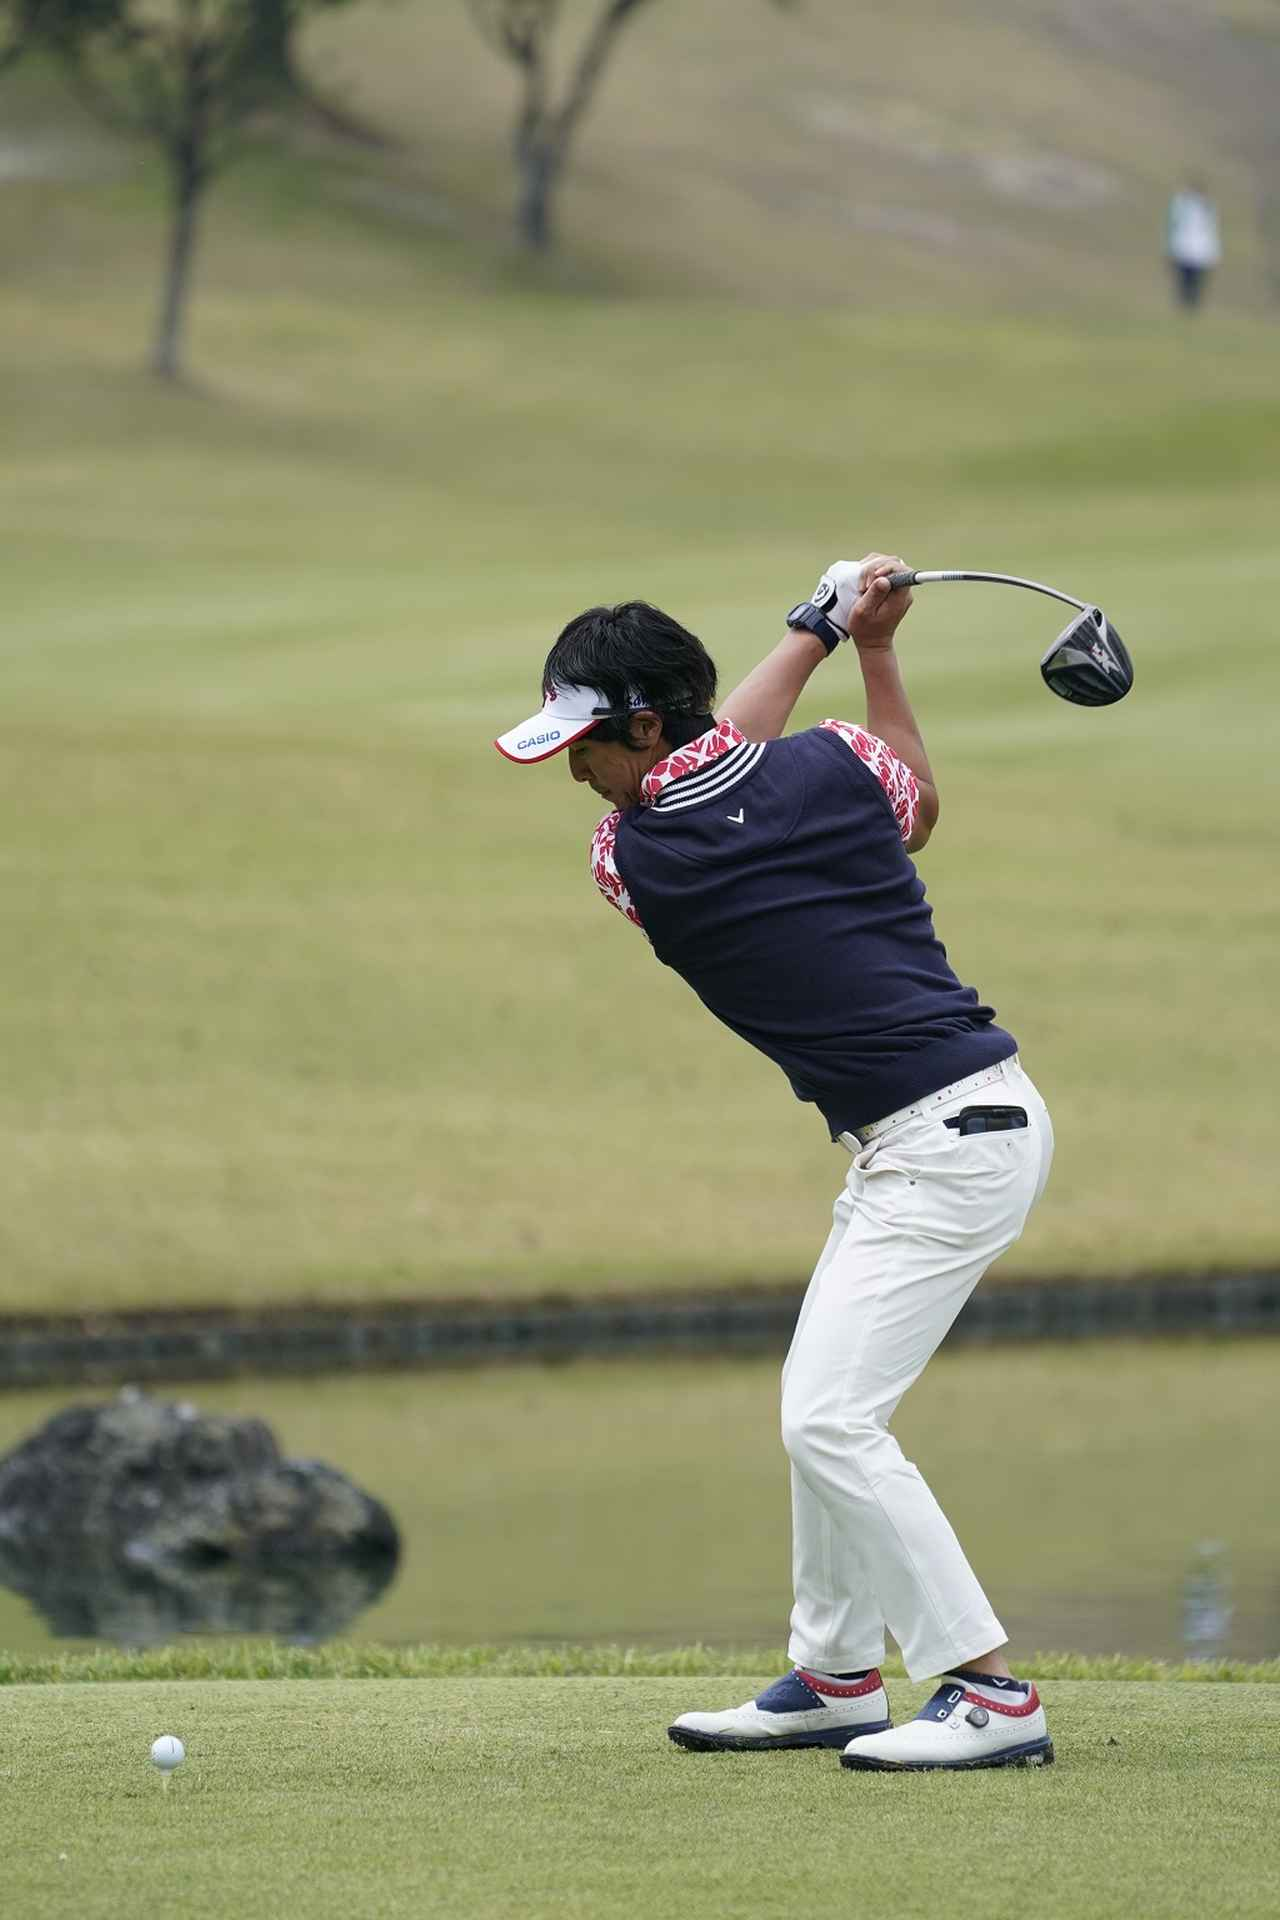 Images : 7番目の画像 - 石川遼ドライバー前方連続写真 - みんなのゴルフダイジェスト